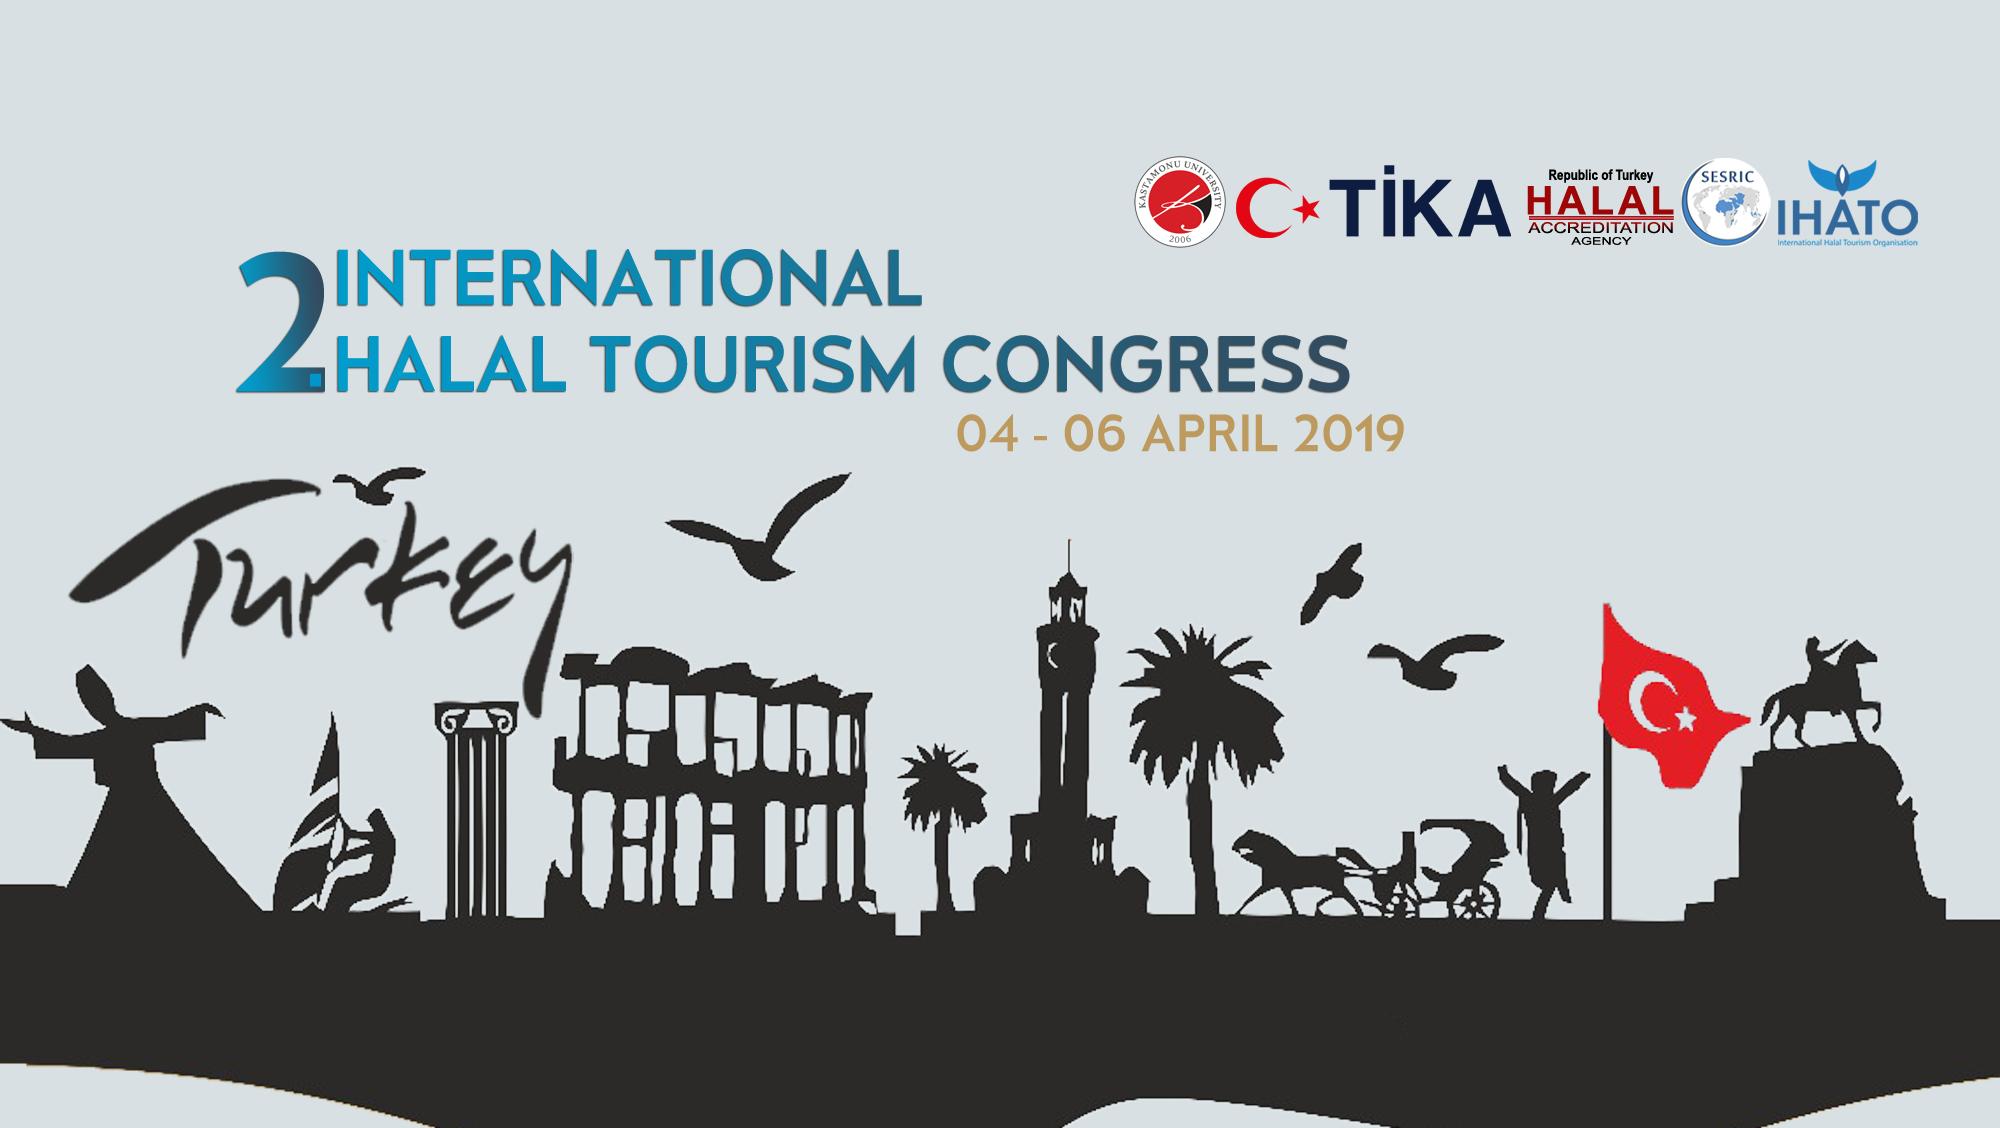 2. International Halal Tourism Congress – 2019